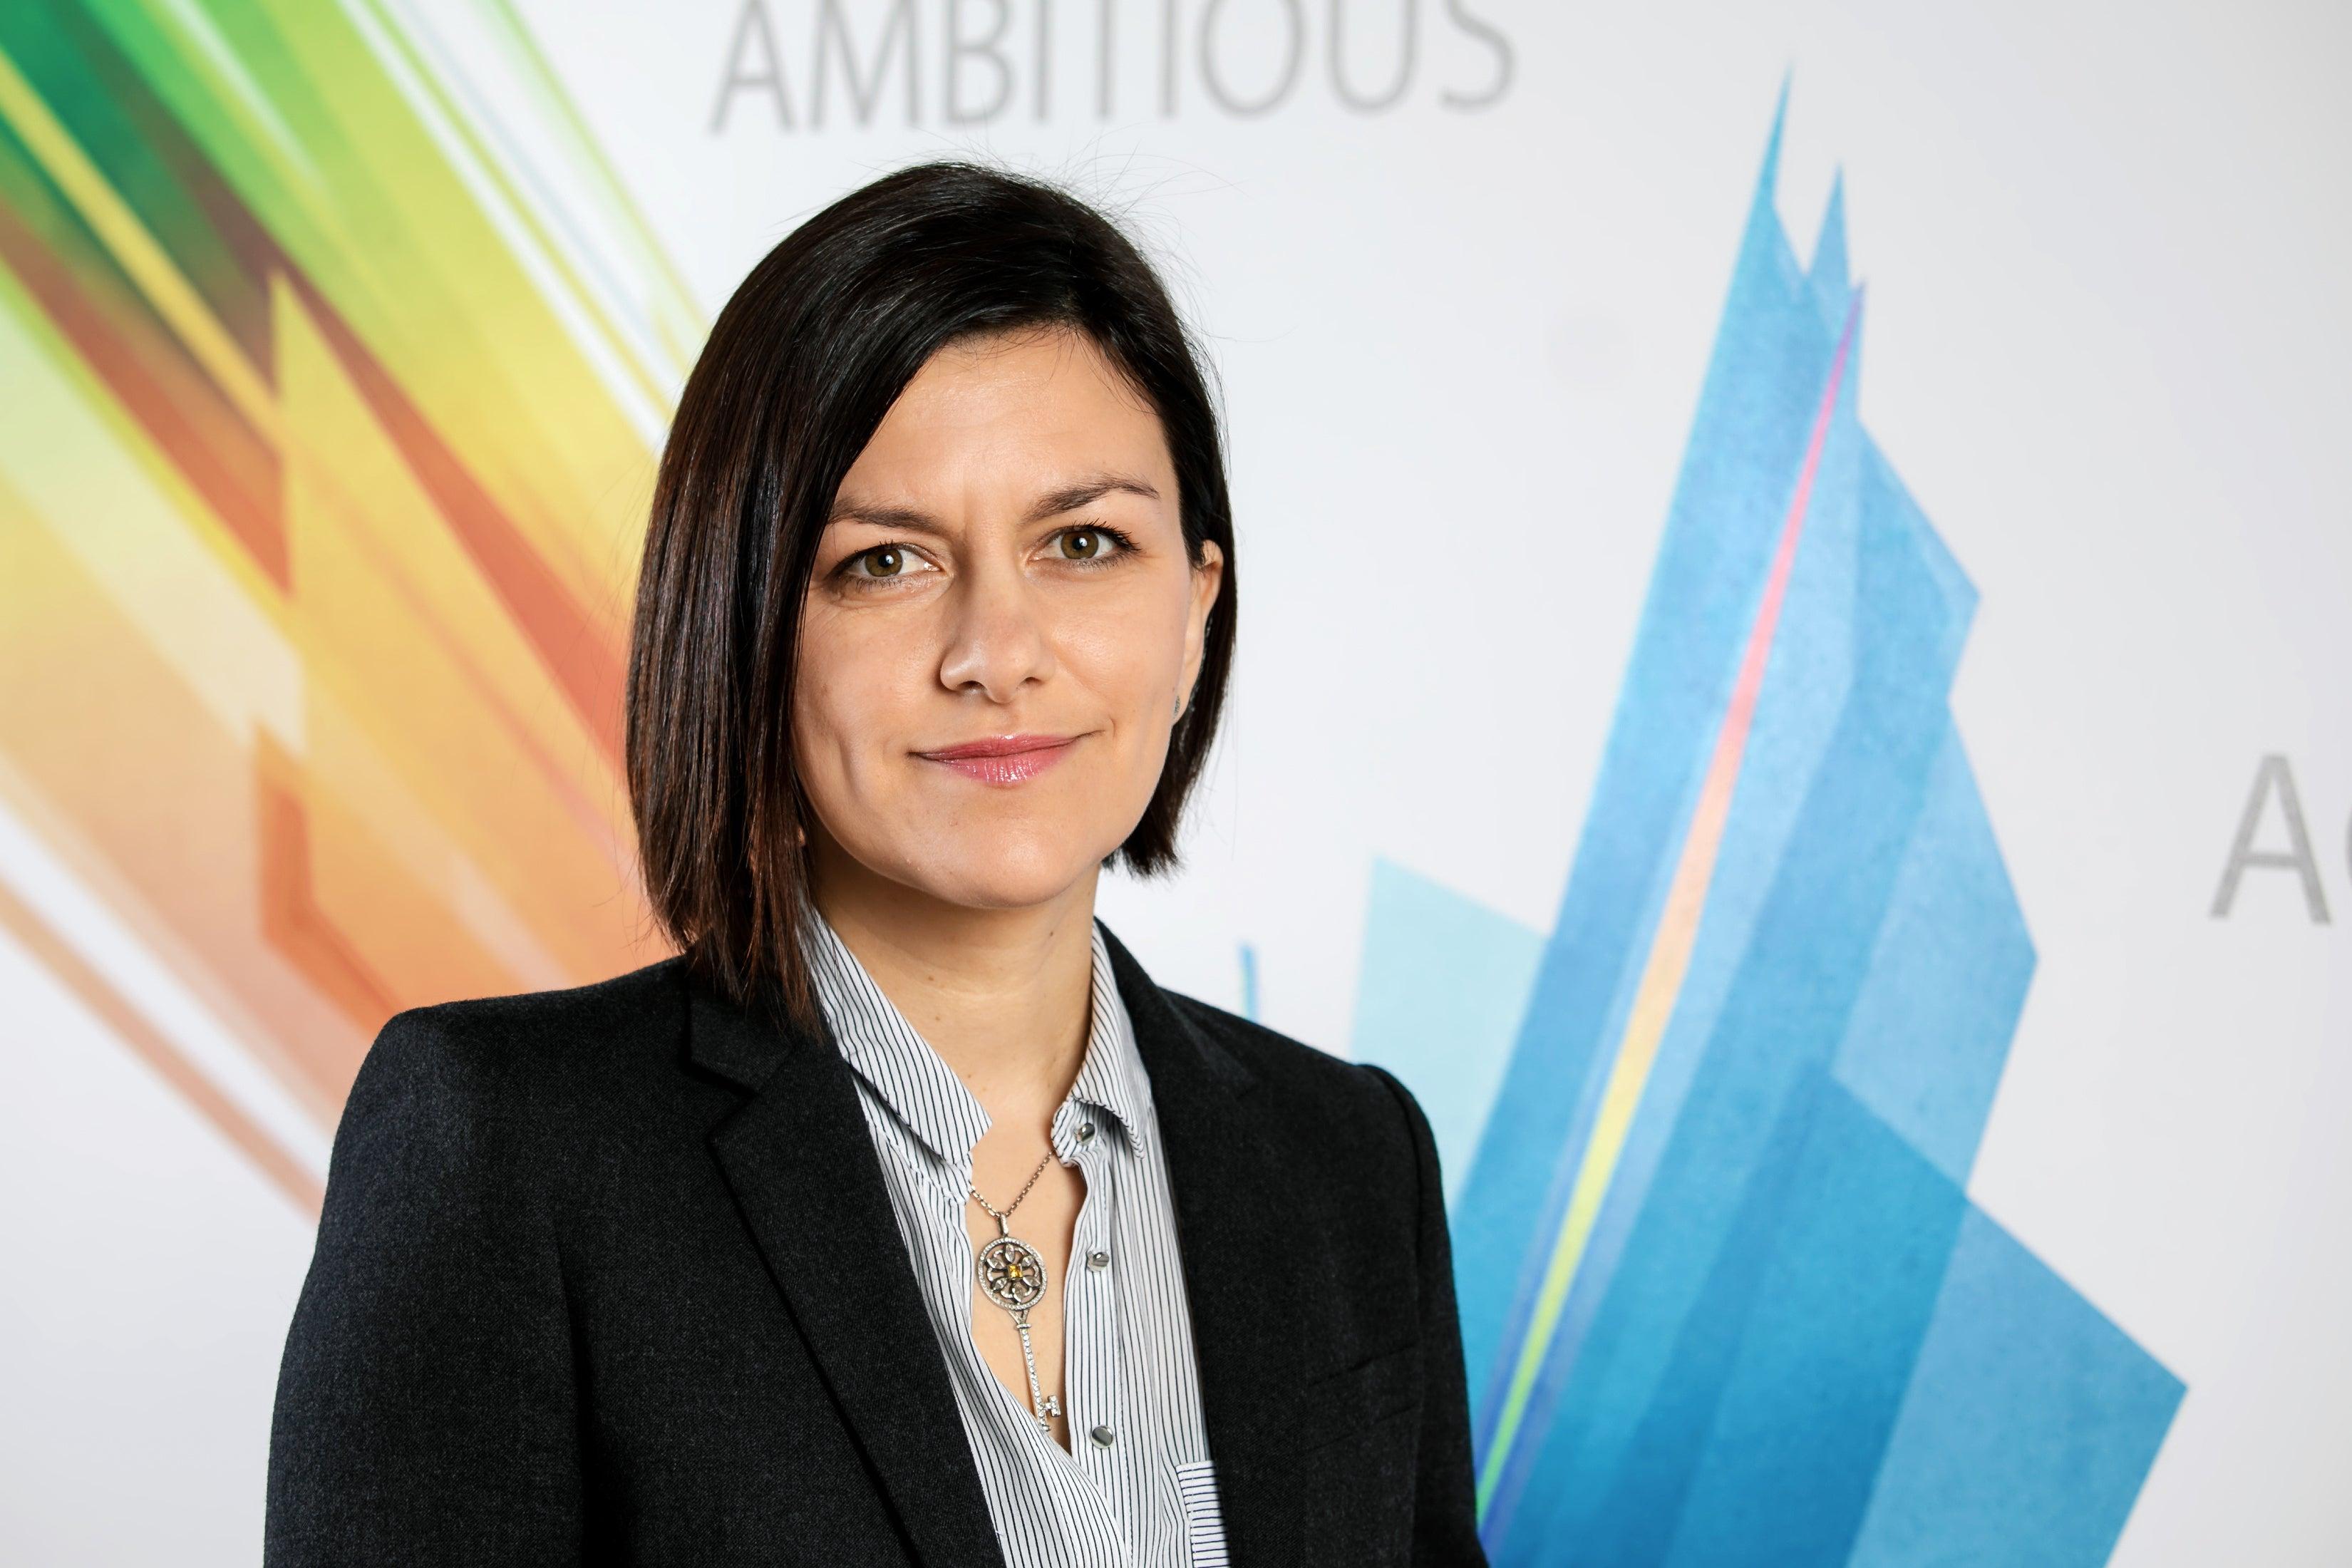 Martina Soukup, Finance Director, Dentsu Aegis Network Croatia